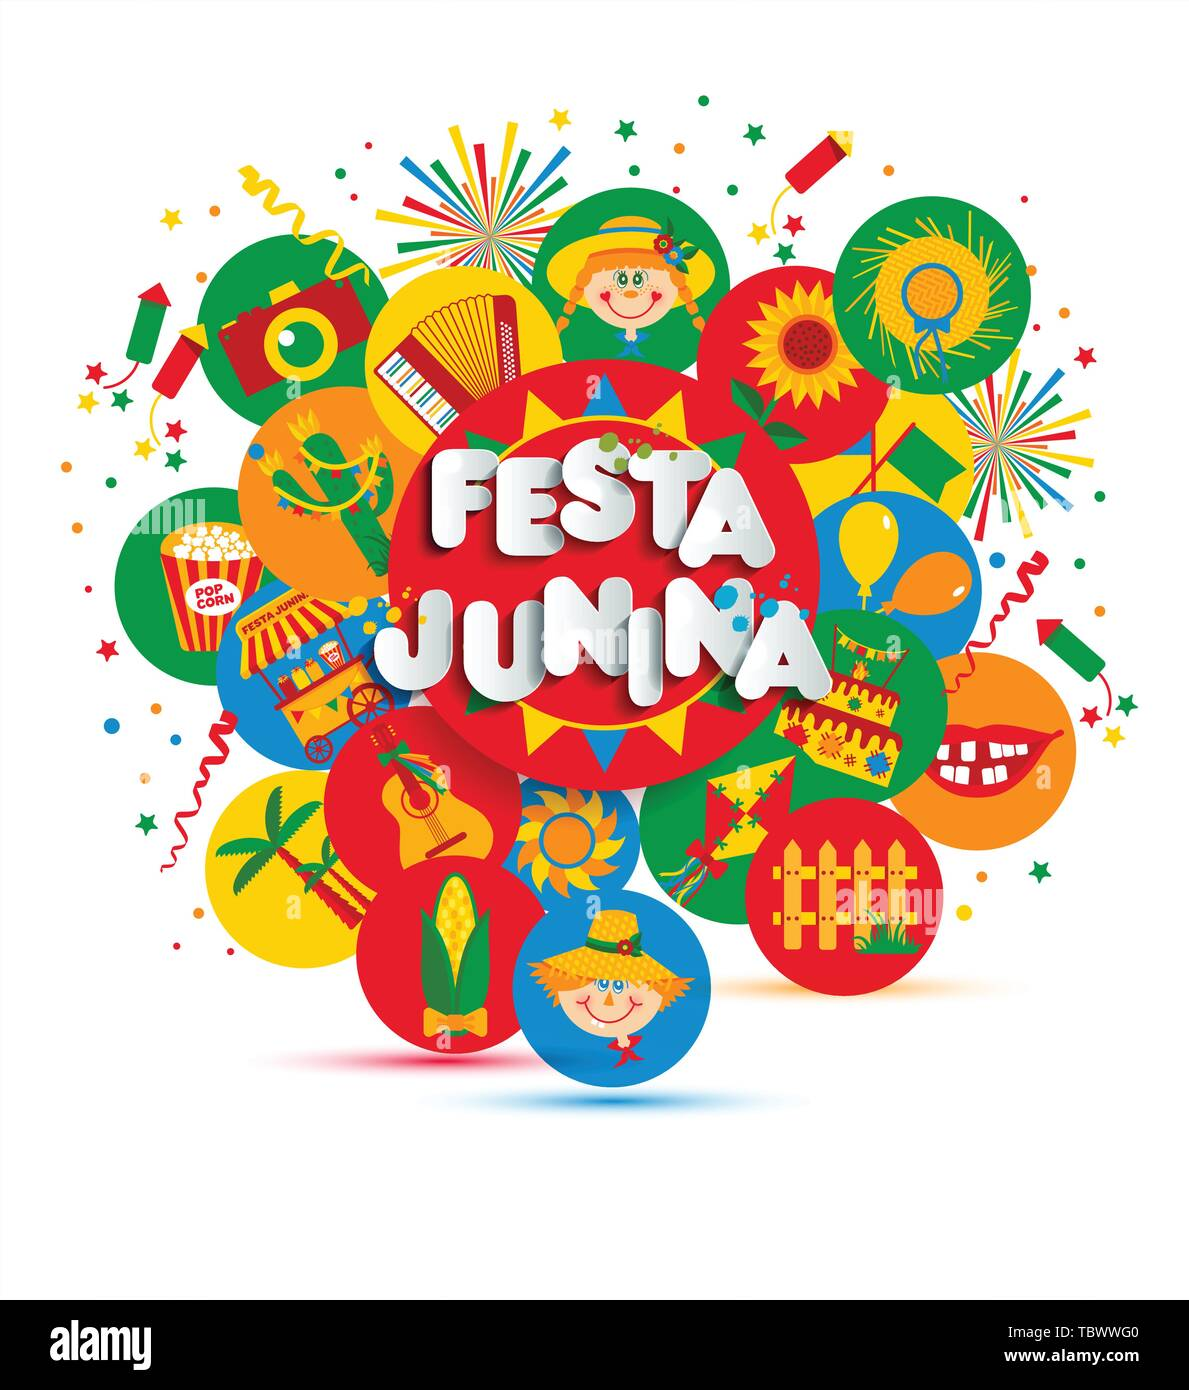 Festa Junina Dorffest In Lateinamerika Icons Set Abbildung